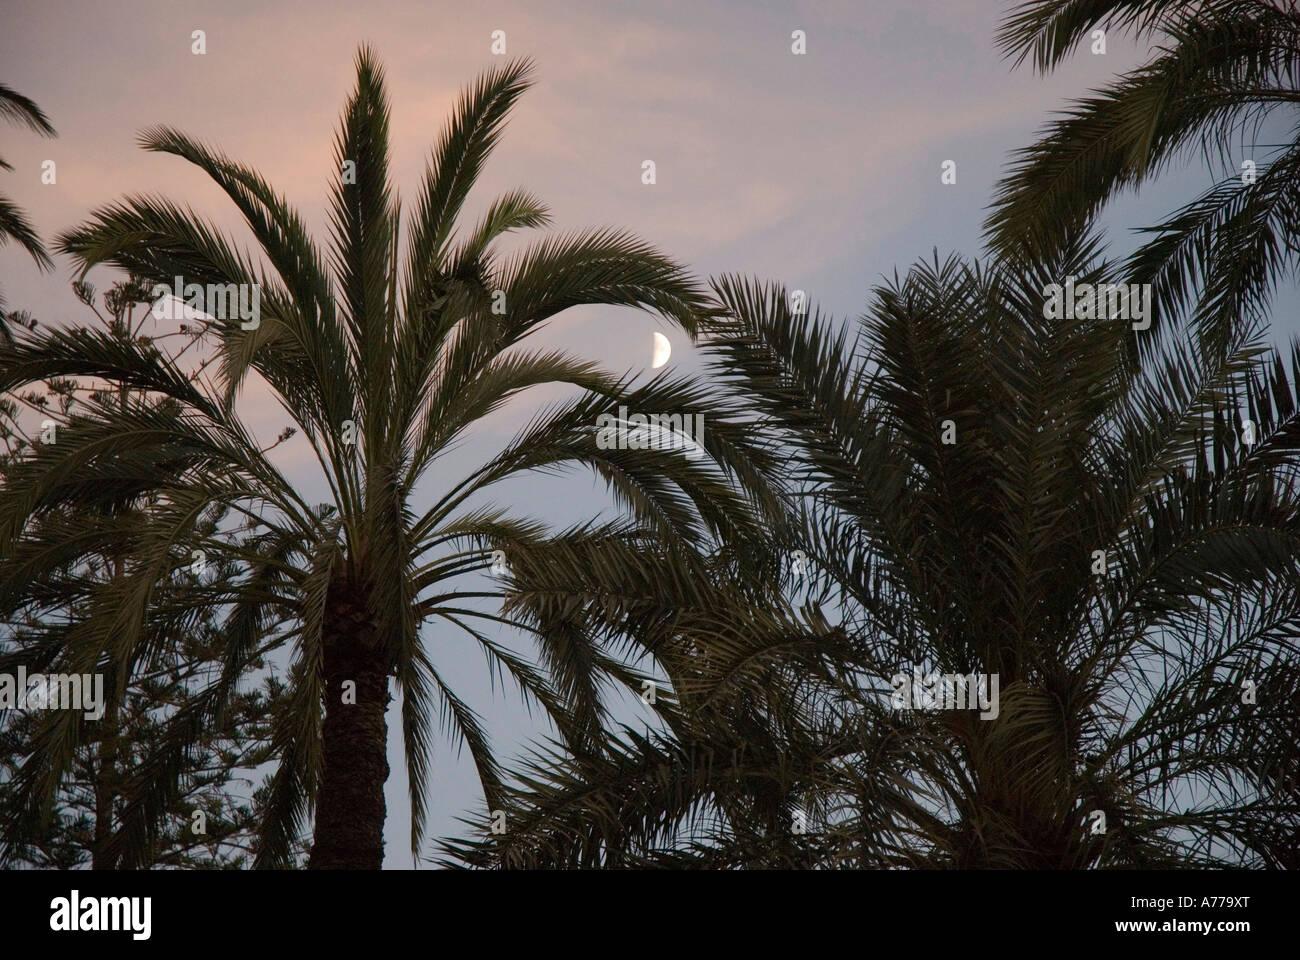 The Elx Palm Grove ELCHE Spain - Stock Image